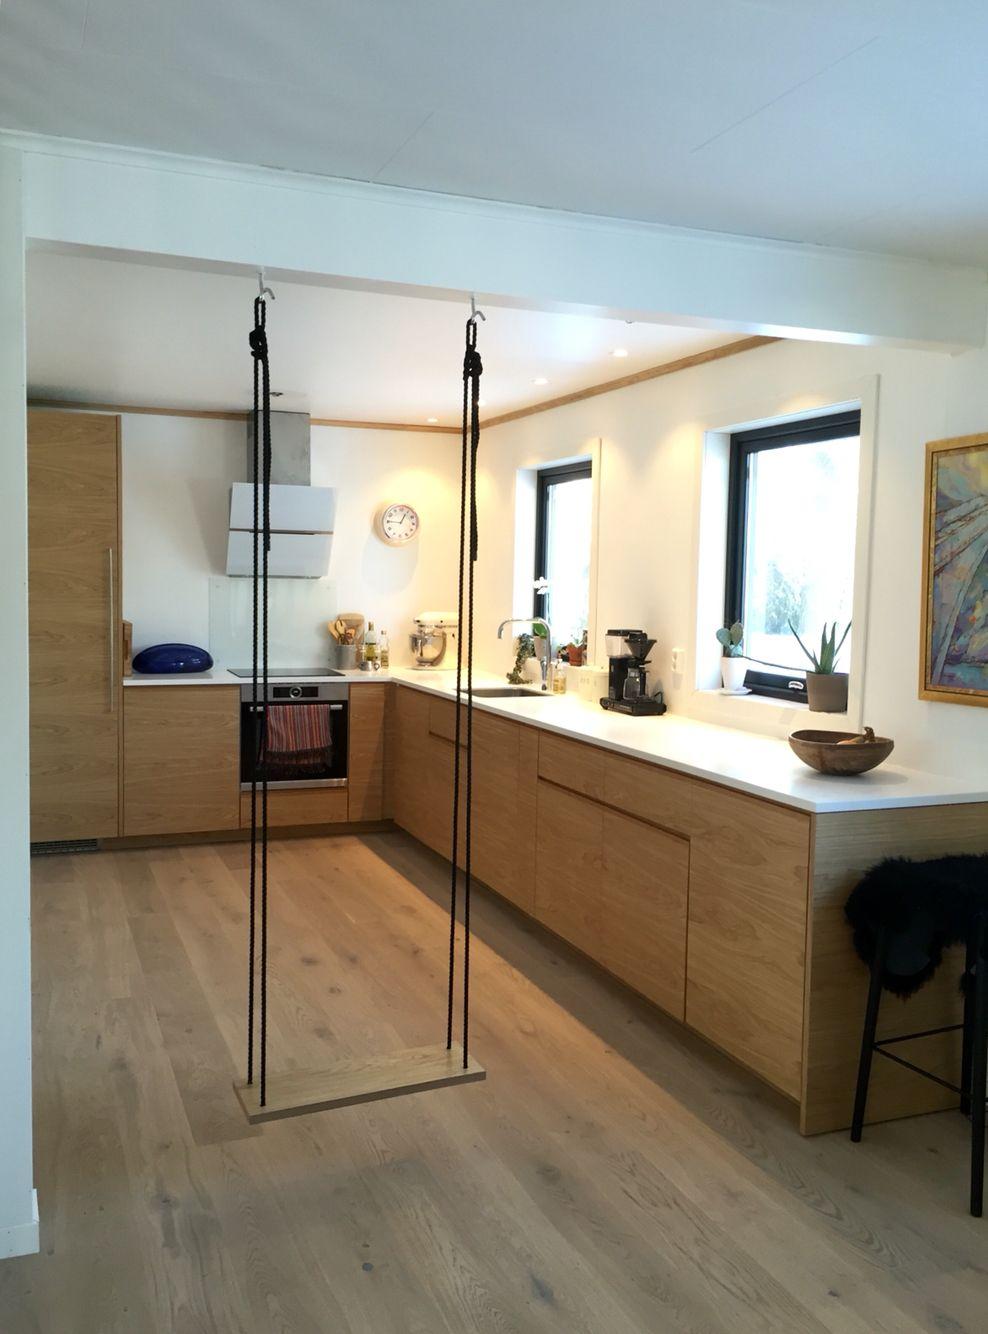 Ikea and kitchens on pinterest